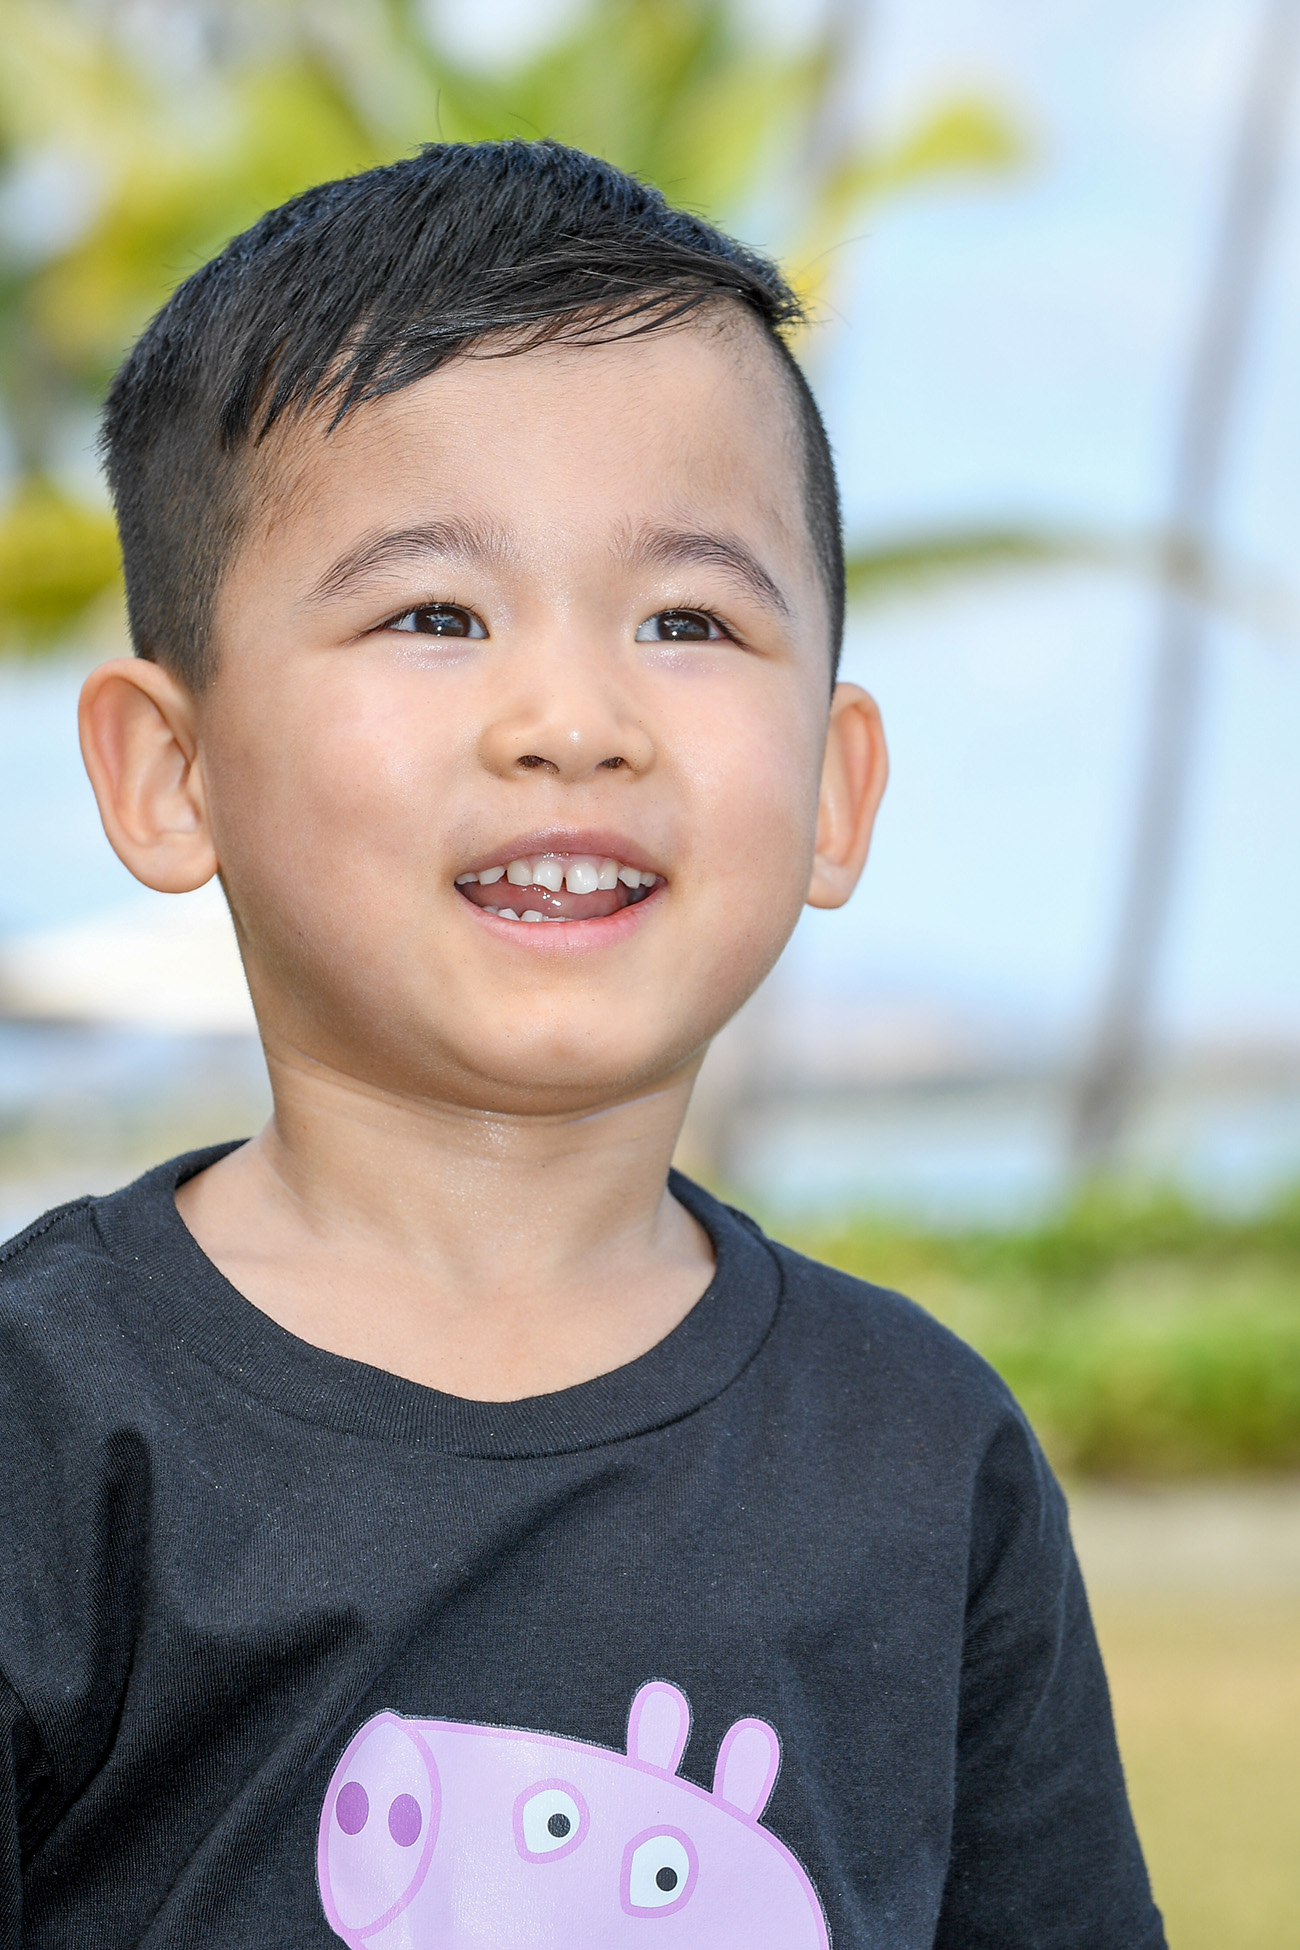 Cute asian boy on the beach against baby blue skies